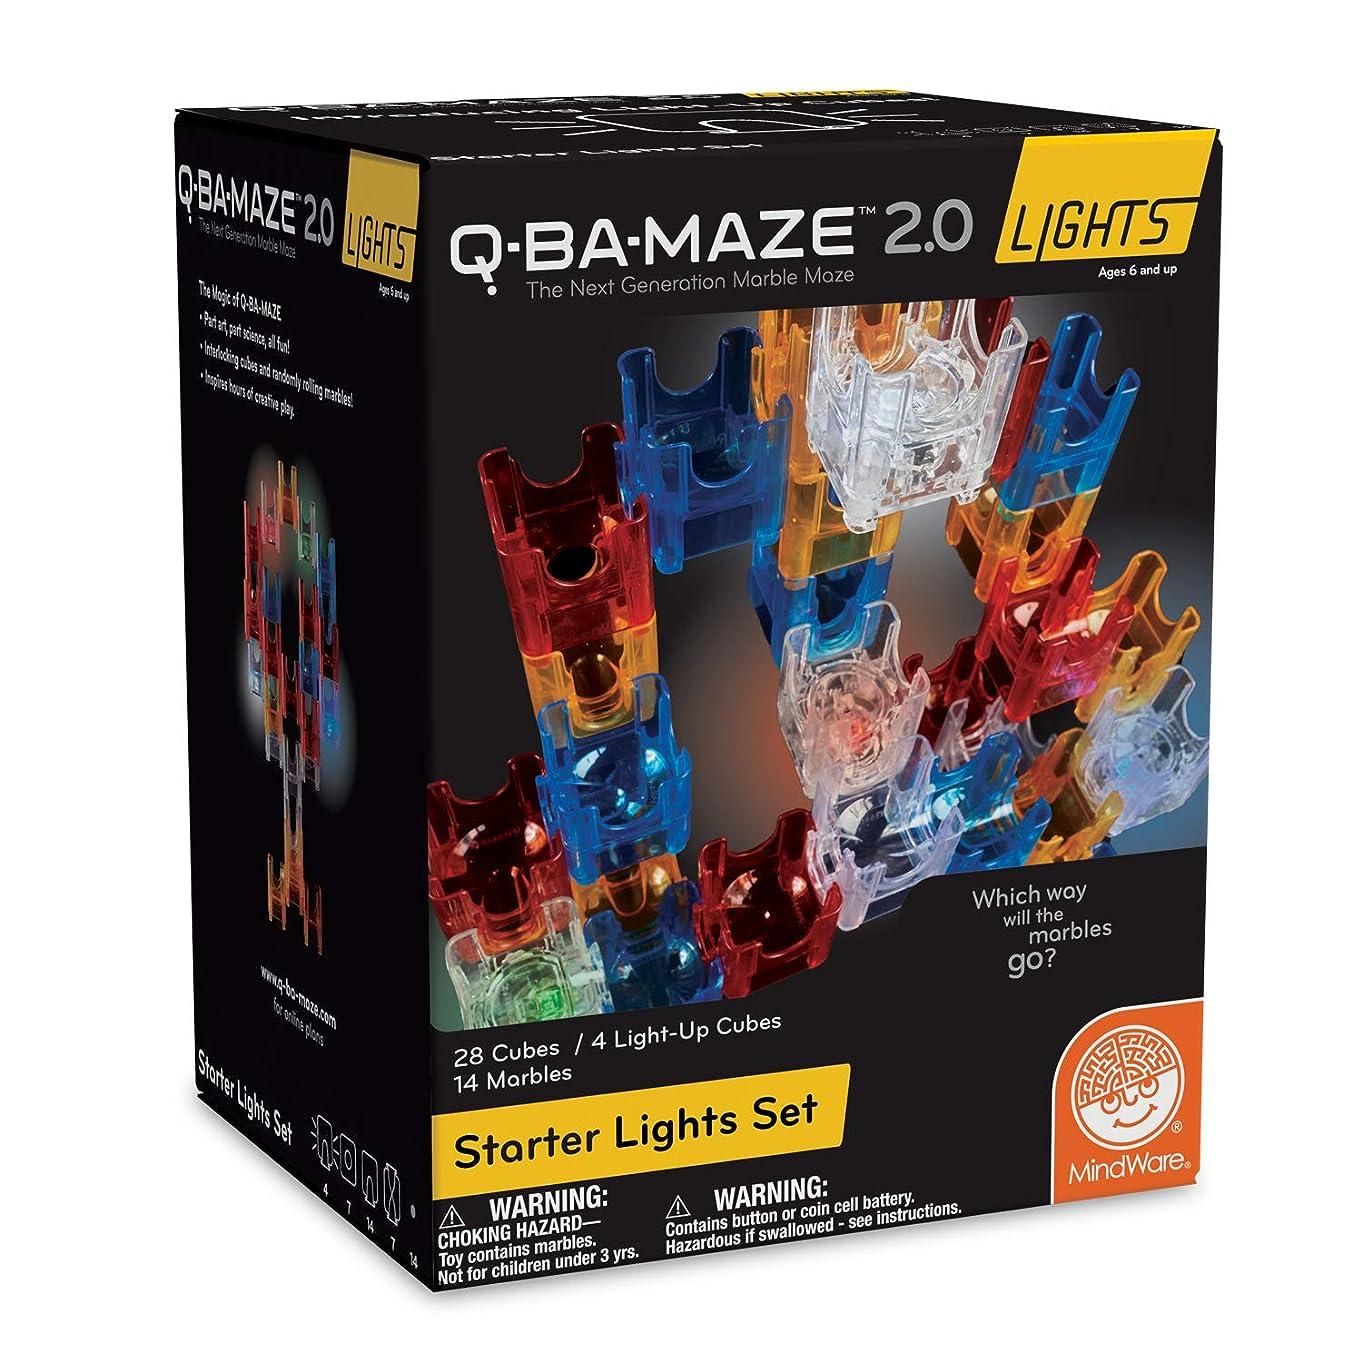 MindWare Q-BA-Maze 2.0 Lights: (Starter Set)